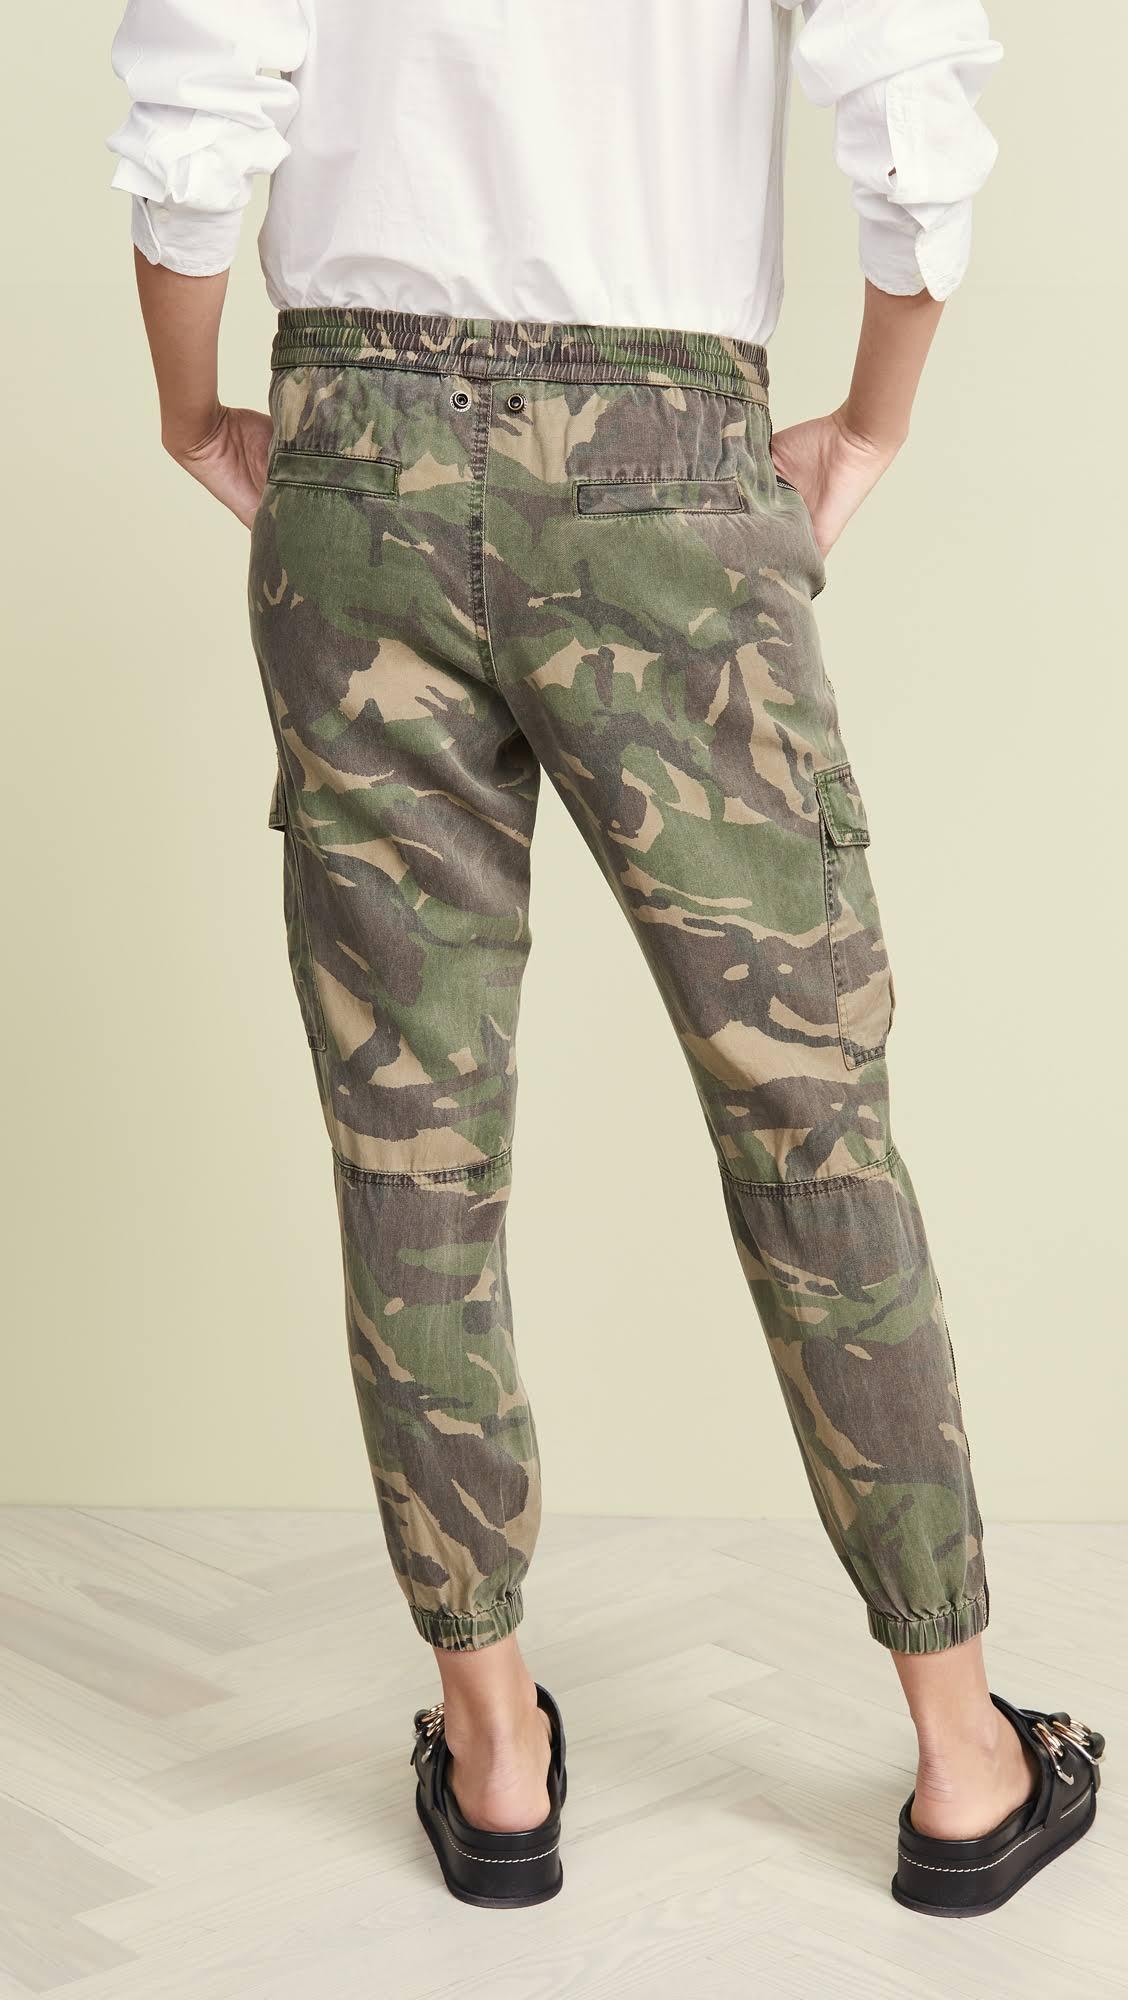 Latérales Rayures Pantalon L Camo amp; Gela Army À Cargo Pam qRYxOXwq